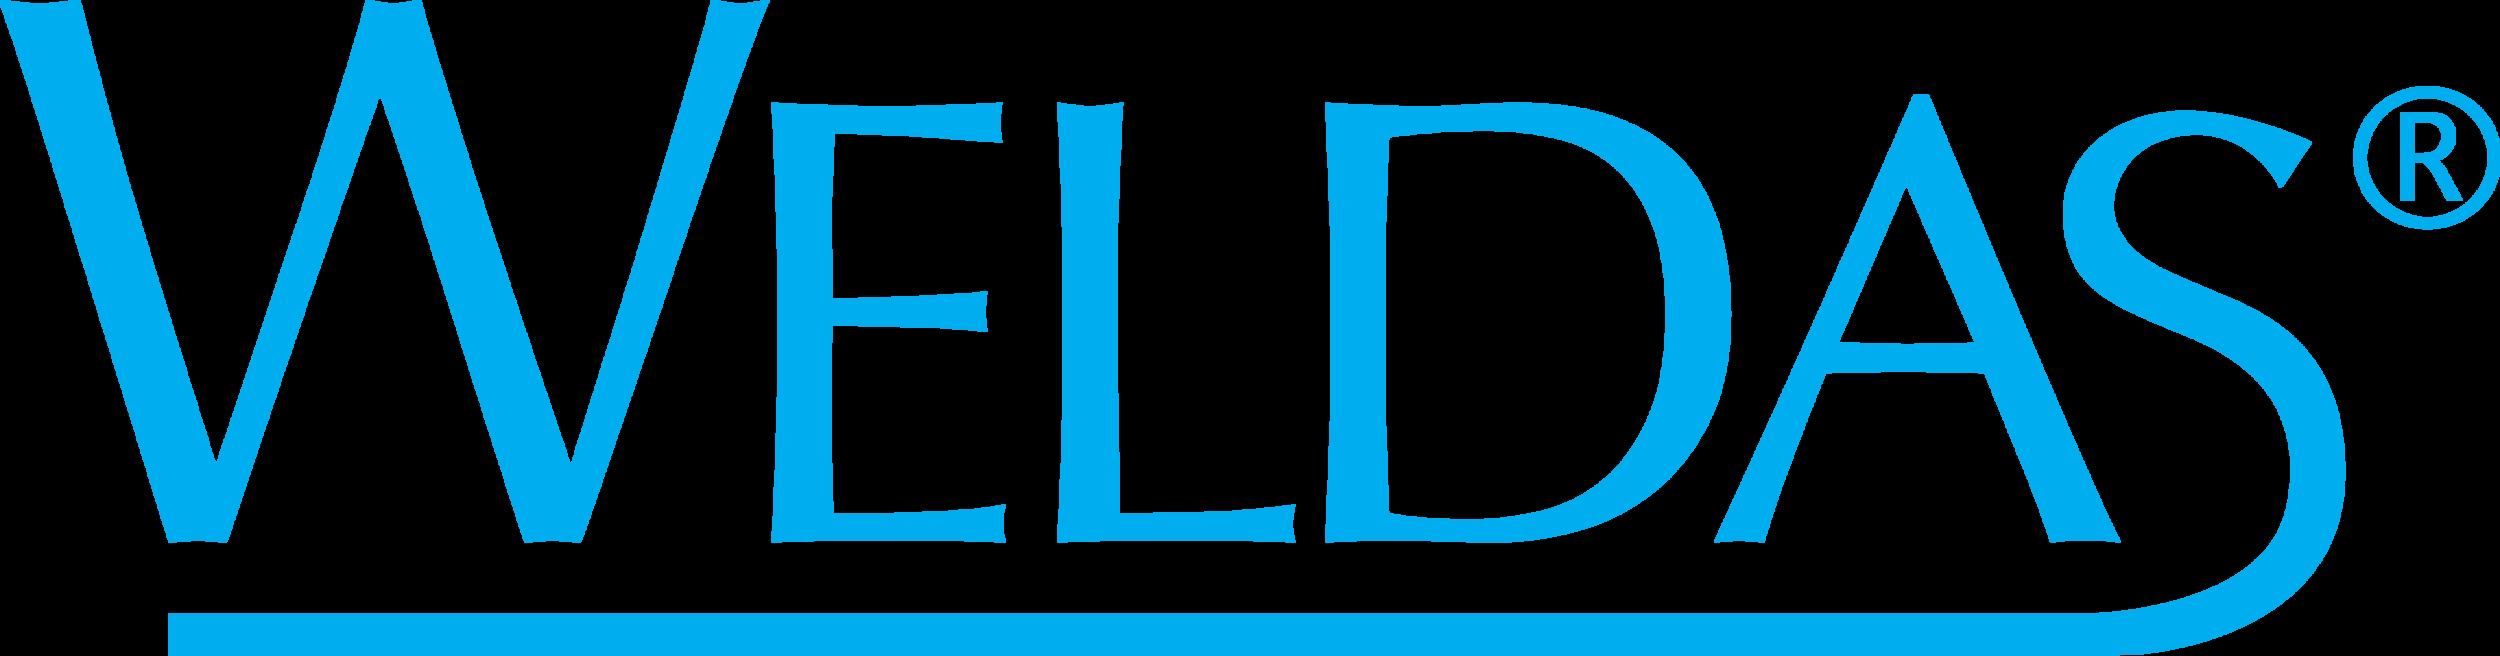 weldas logo.png